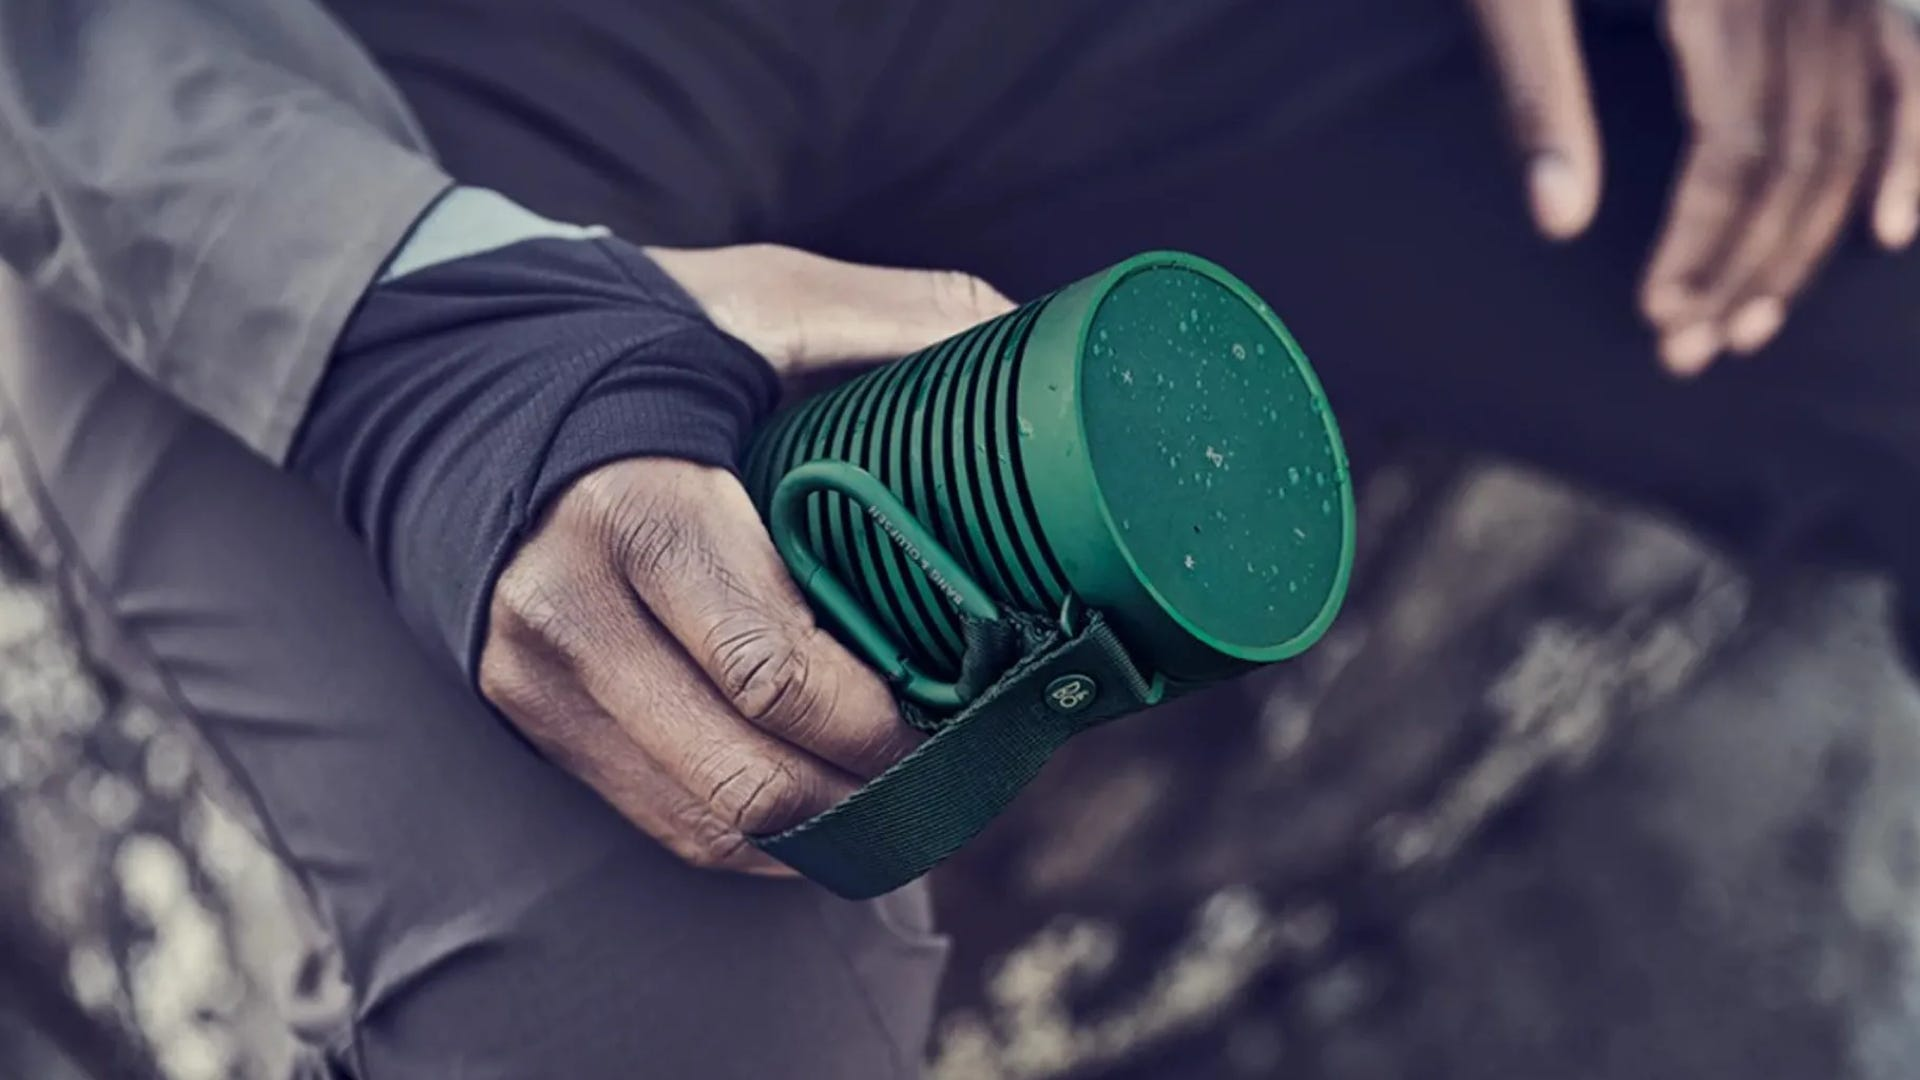 Bang & Olufsen green portable metal speaker